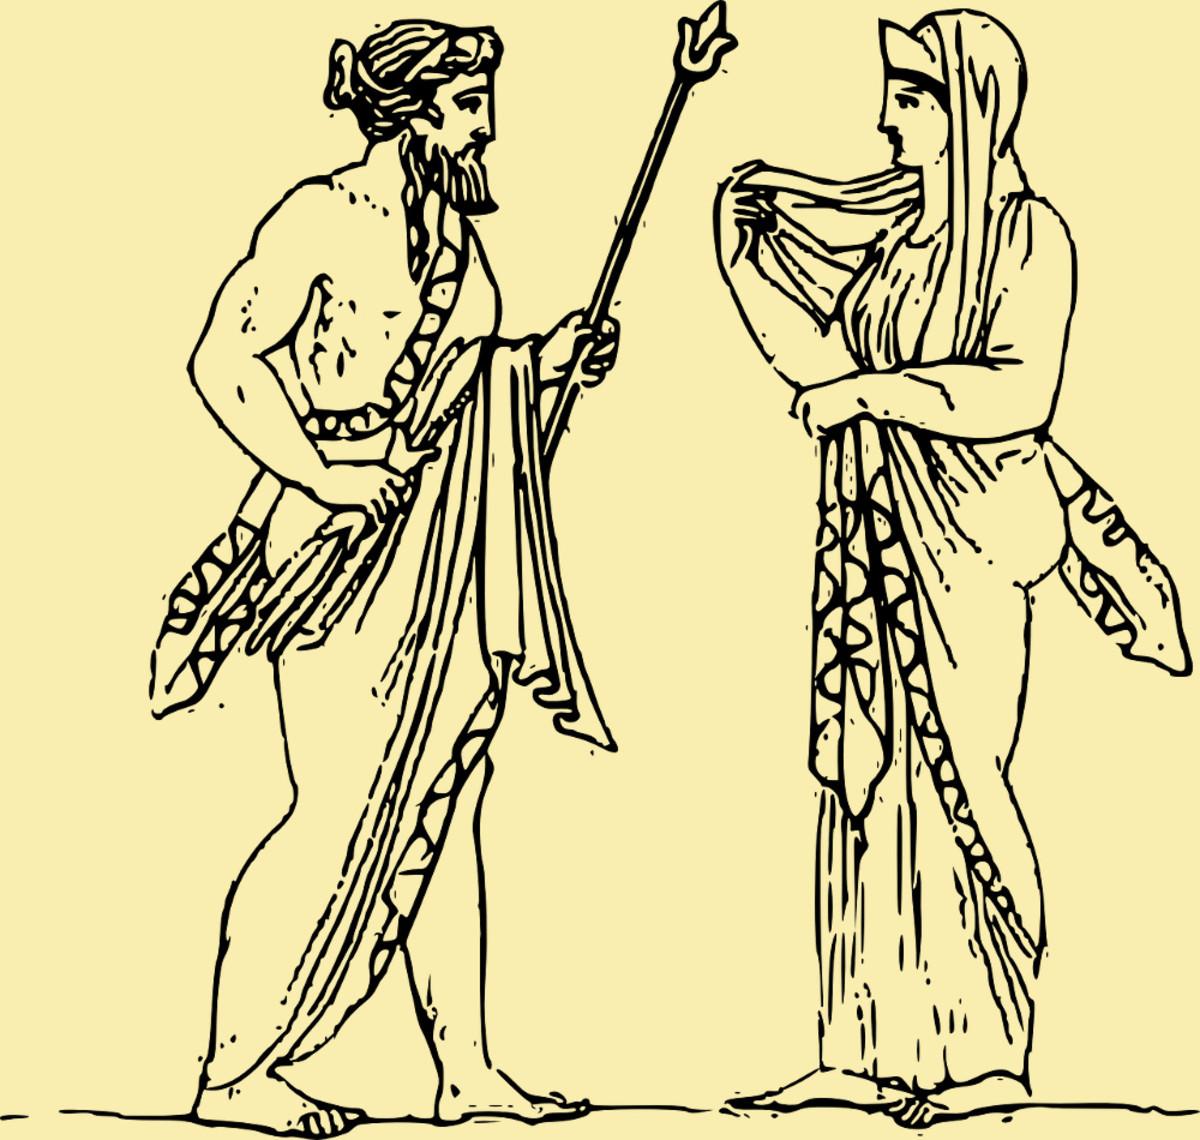 Greek myth mythological figures characters statues